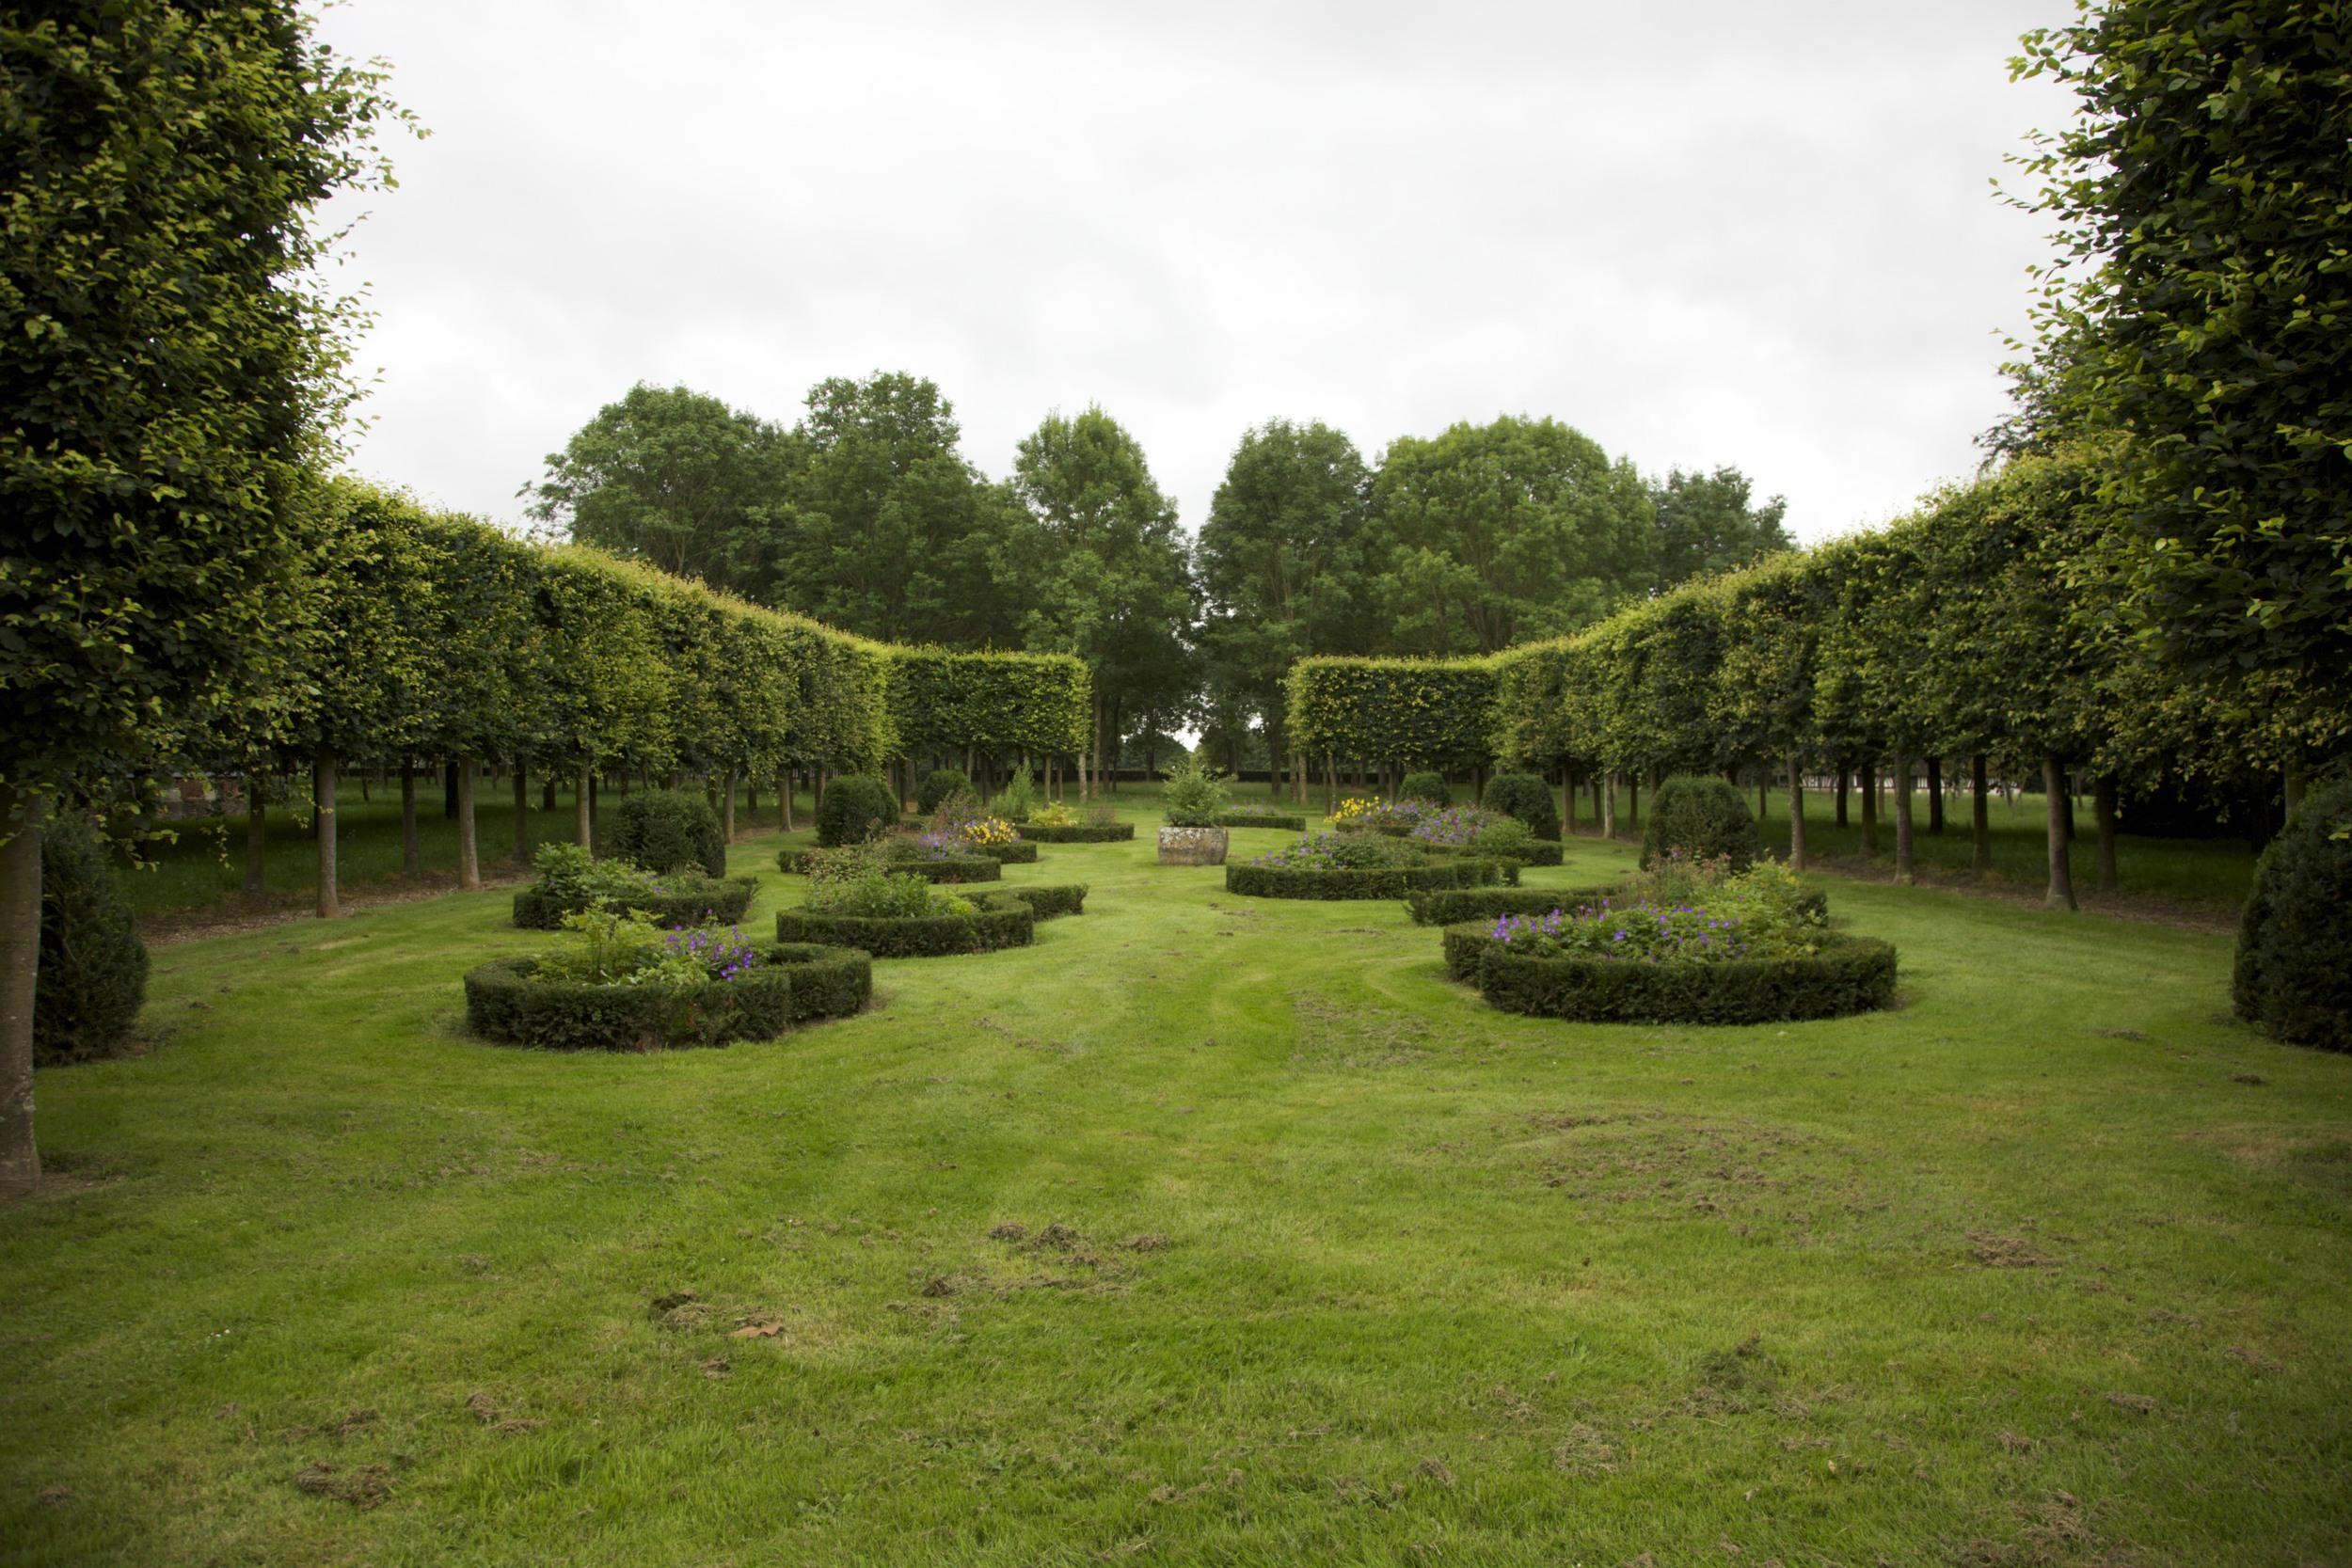 One of Eléonore's gardens in Normandie.